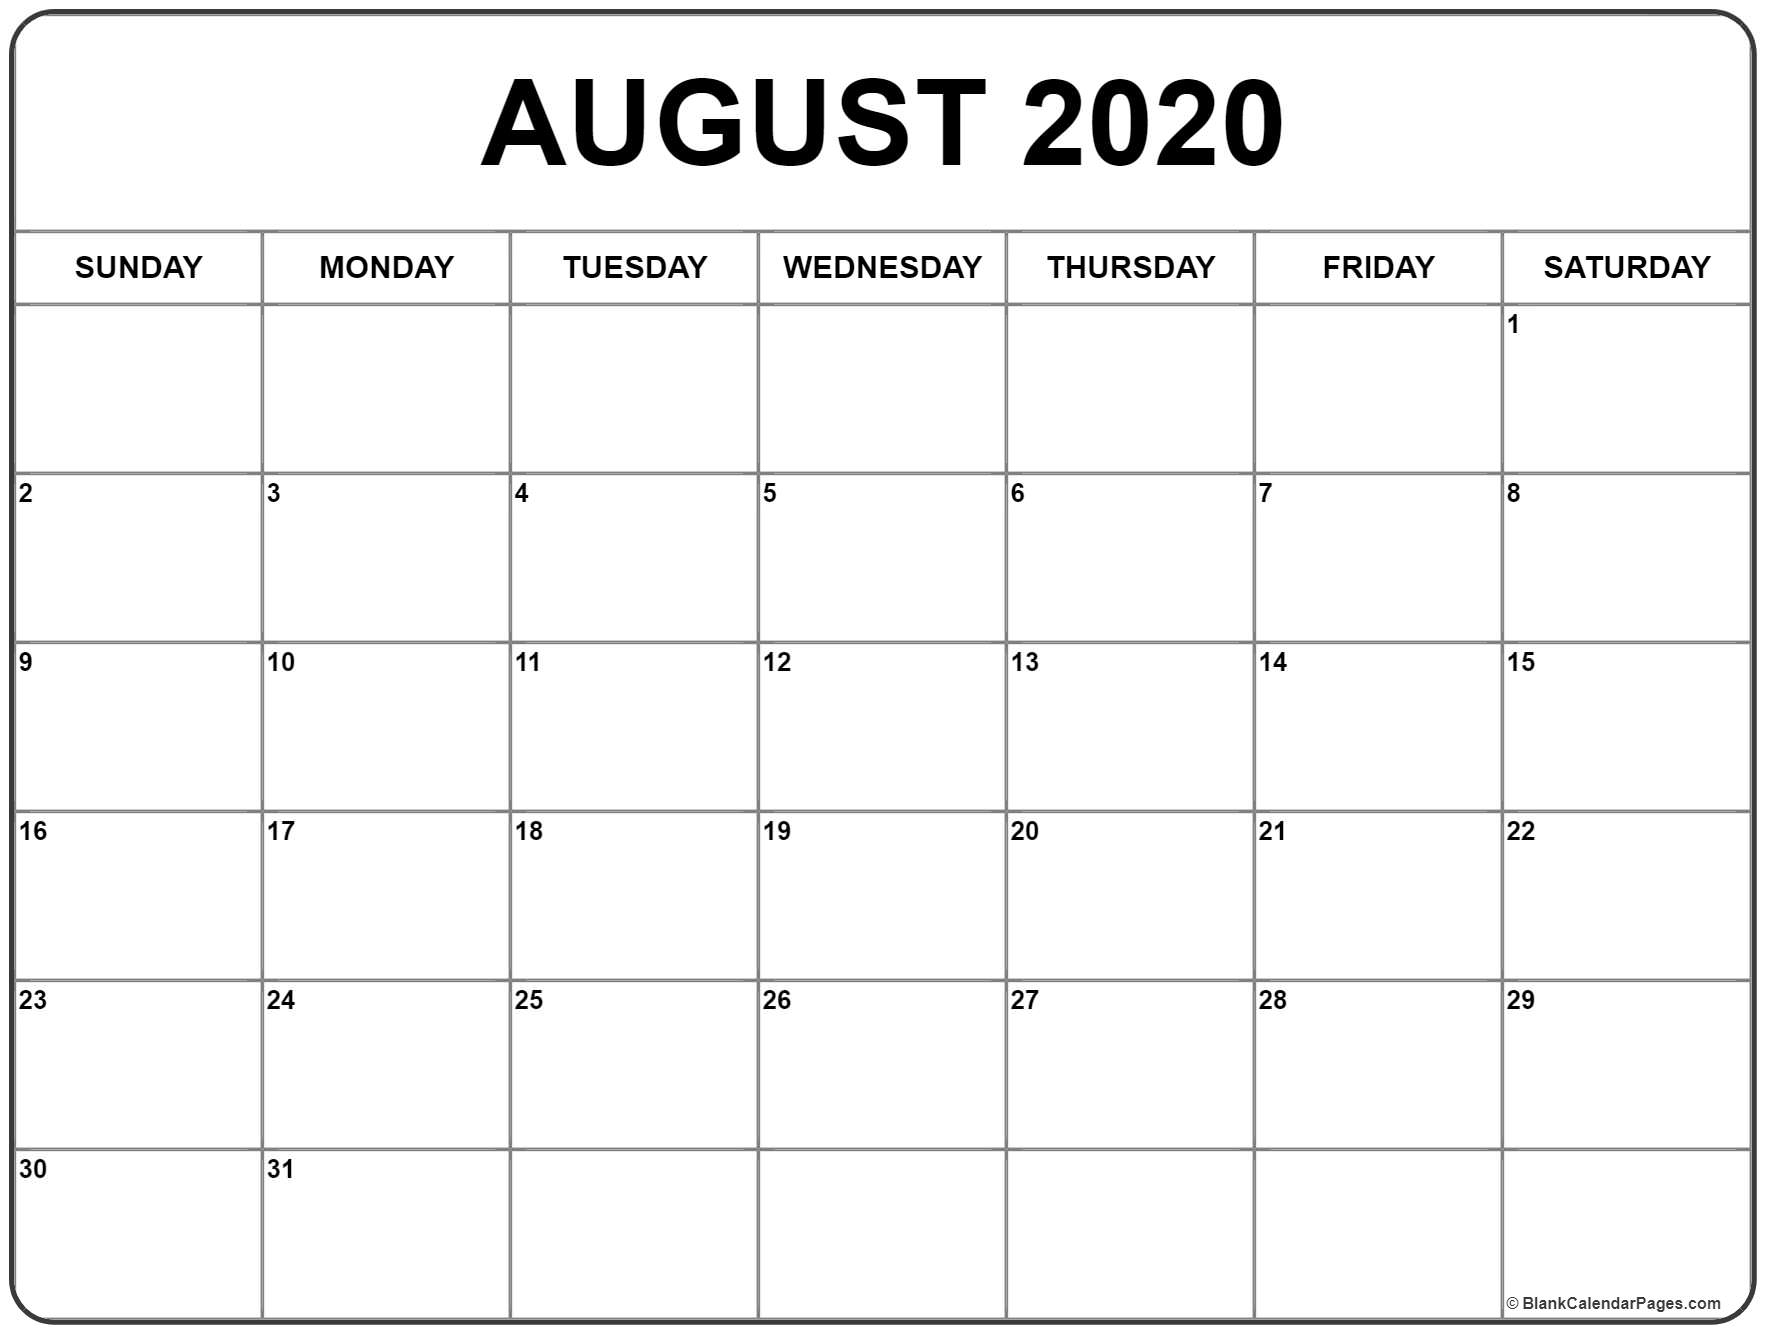 August 2020 Calendar   Free Printable Monthly Calendars throughout June July August 2020 Calendar